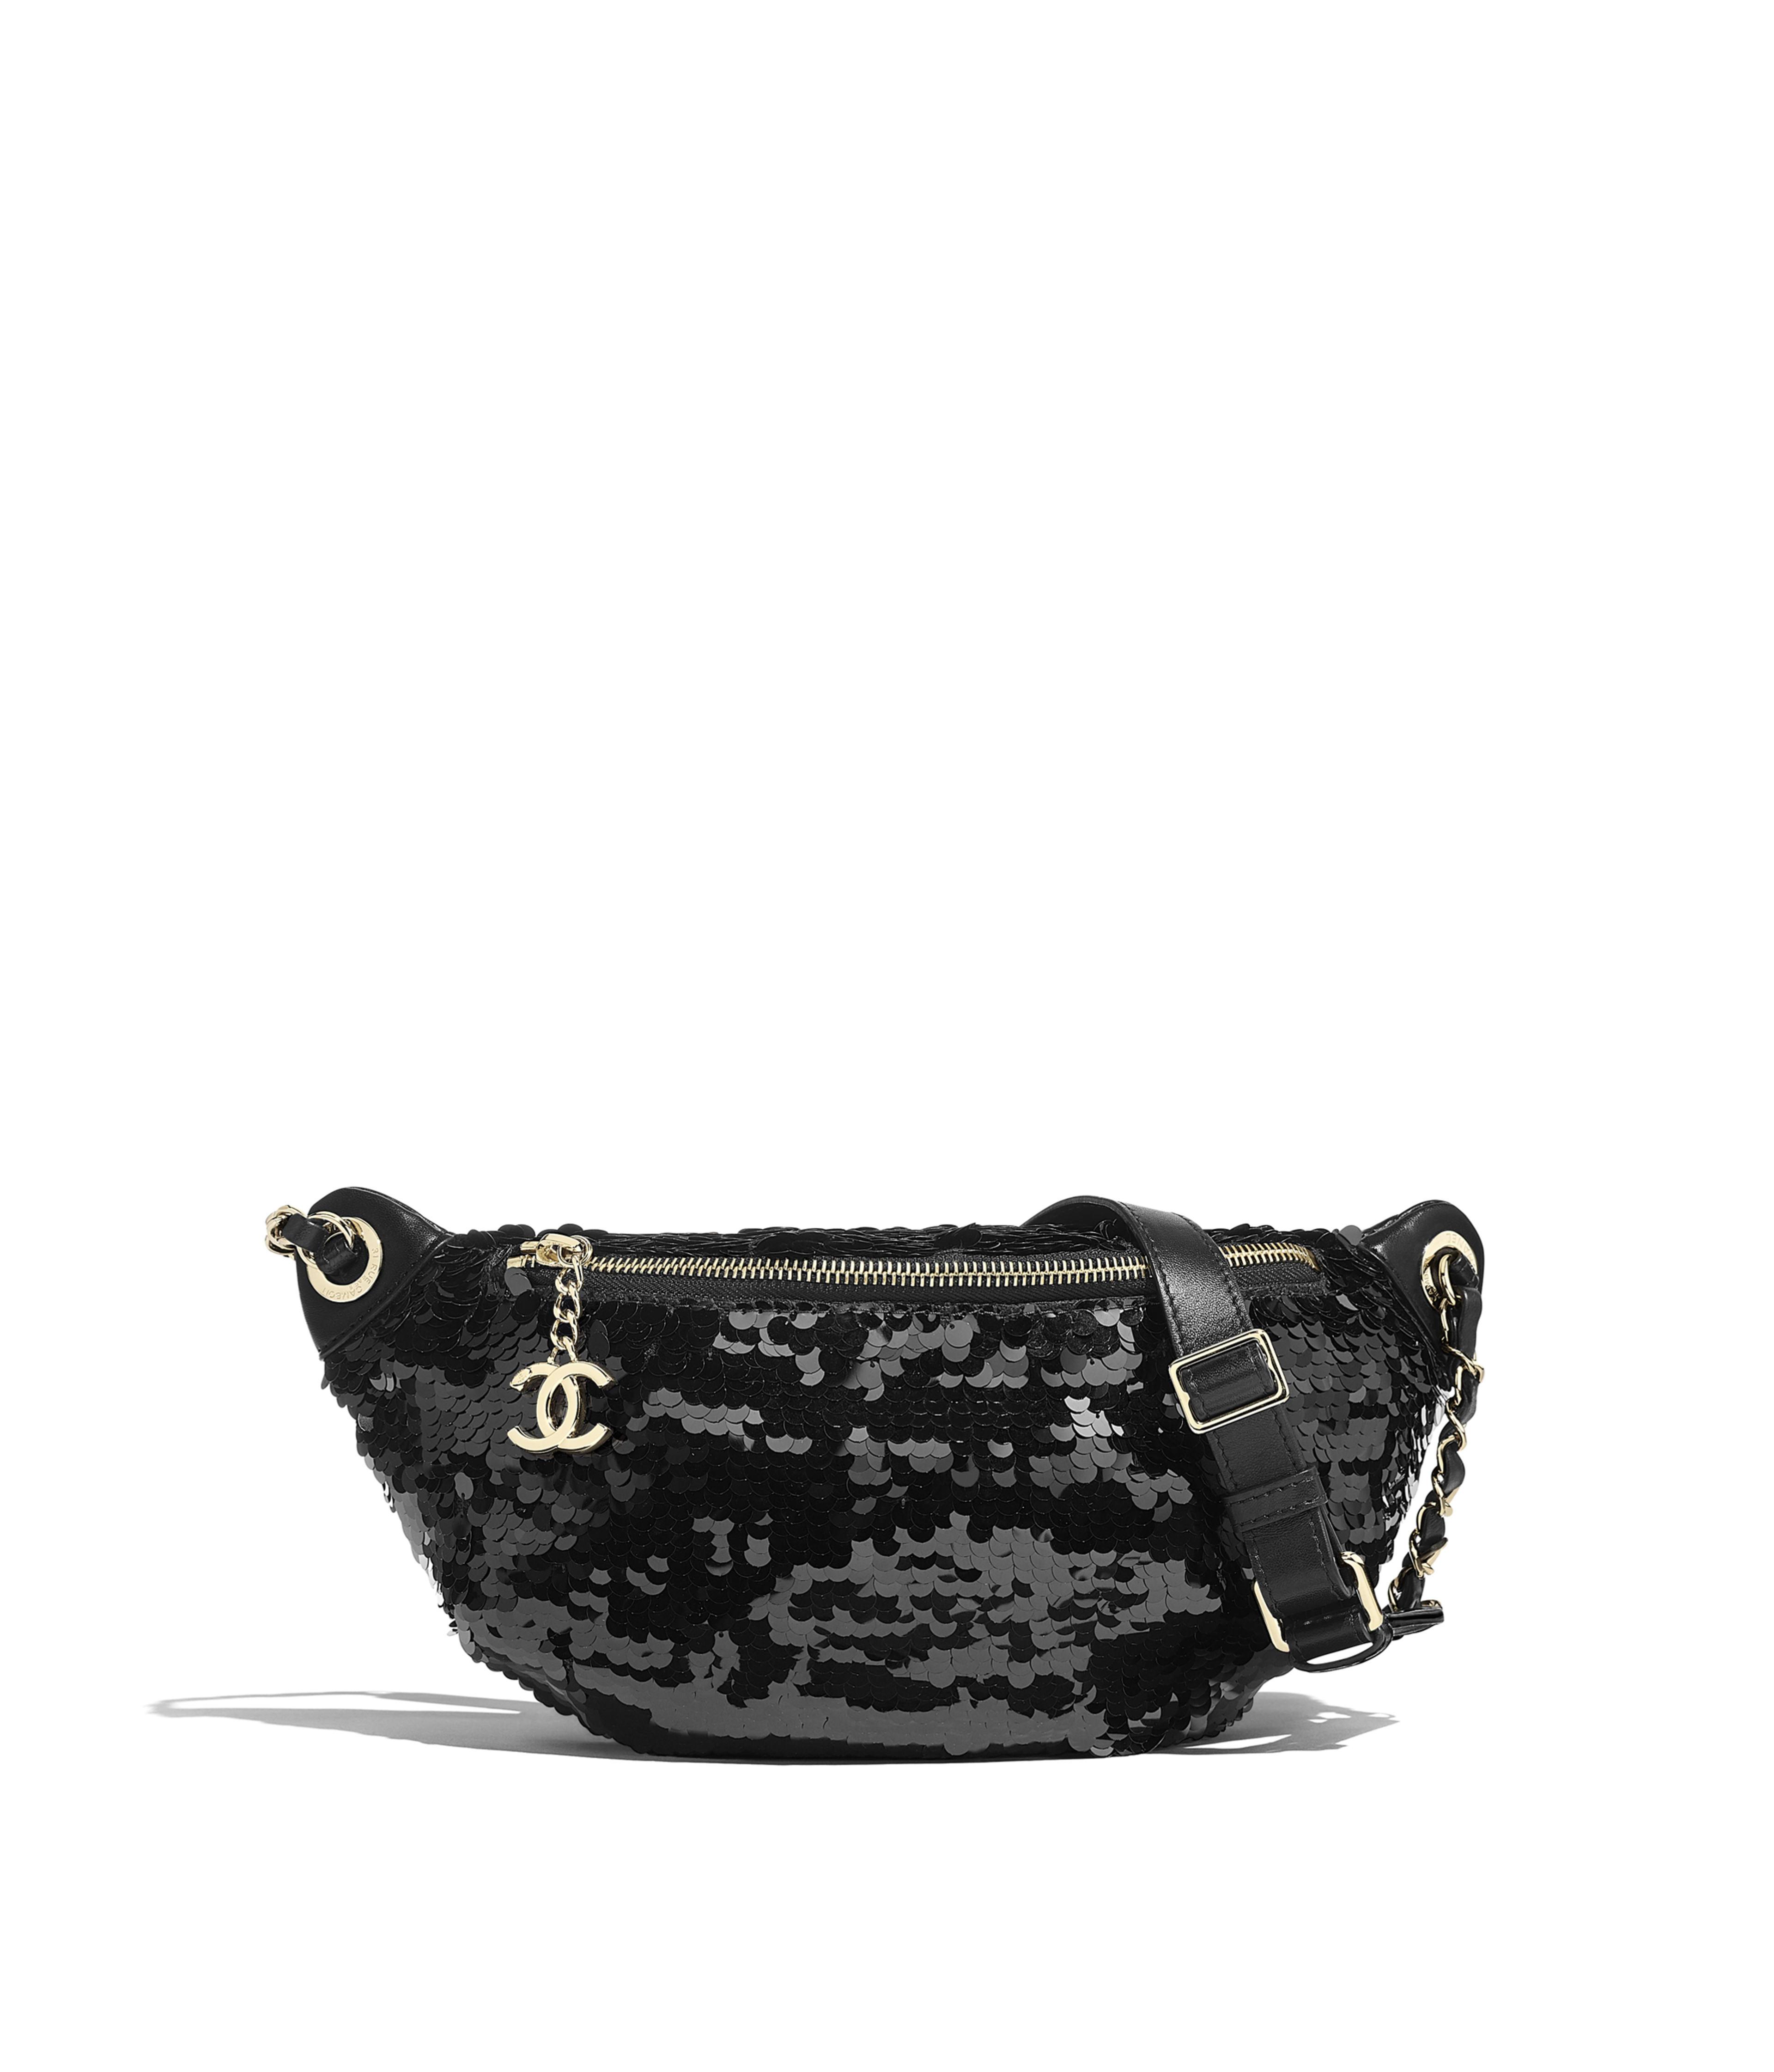 401b0245eaa4 Waist Bag Sequins, Lambskin & Gold-Tone Metal, Black Ref. AS0363B0018894305